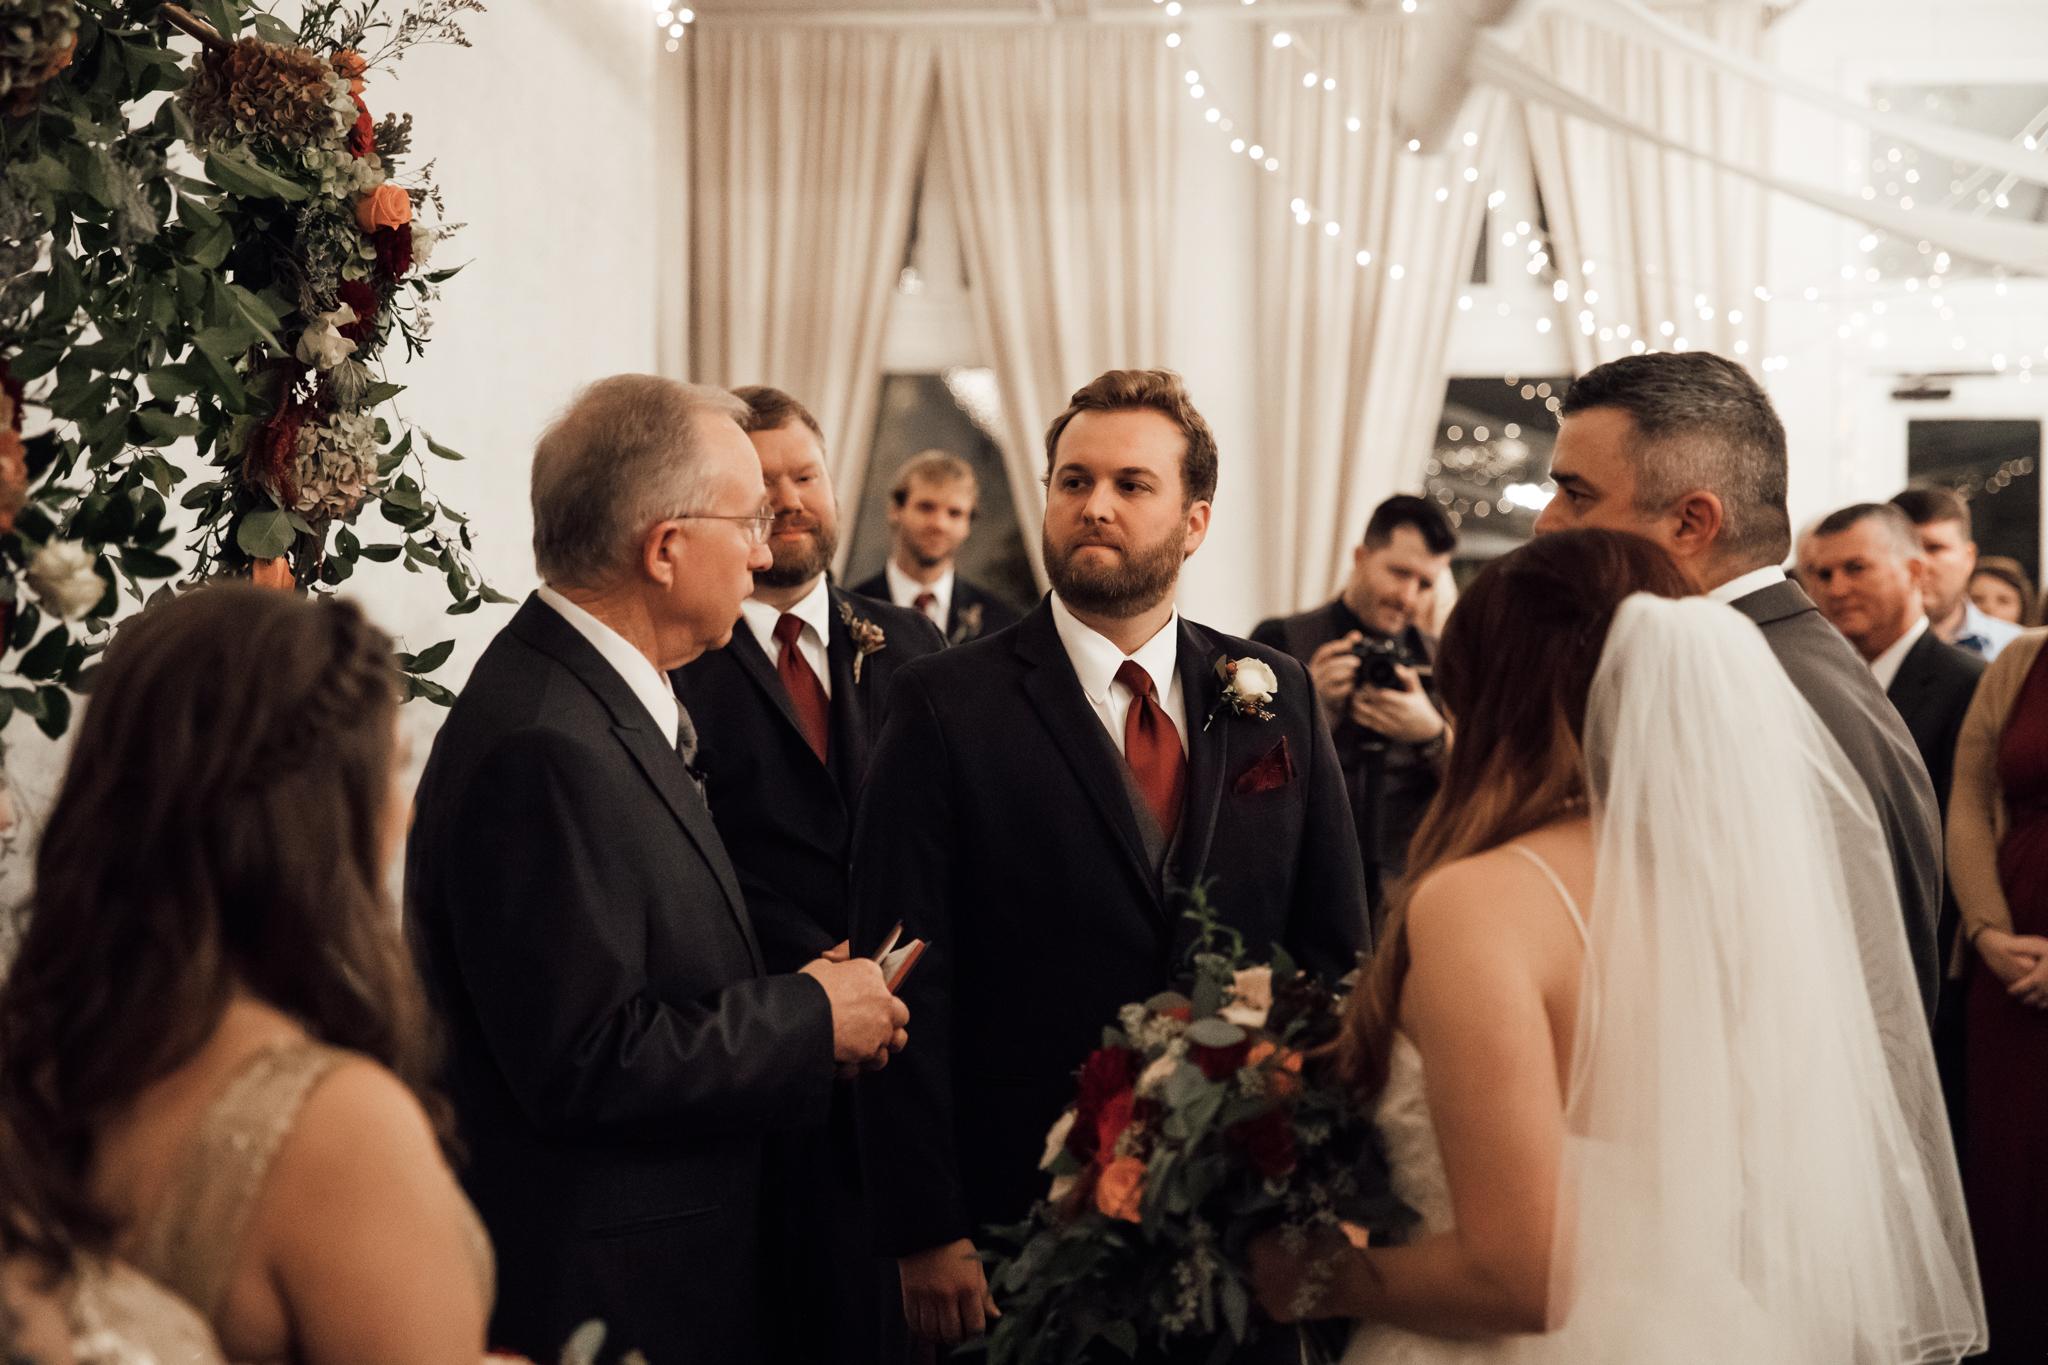 memphis-wedding-photographers-thewarmtharoundyou-ballinese-ballroom (139 of 232).jpg